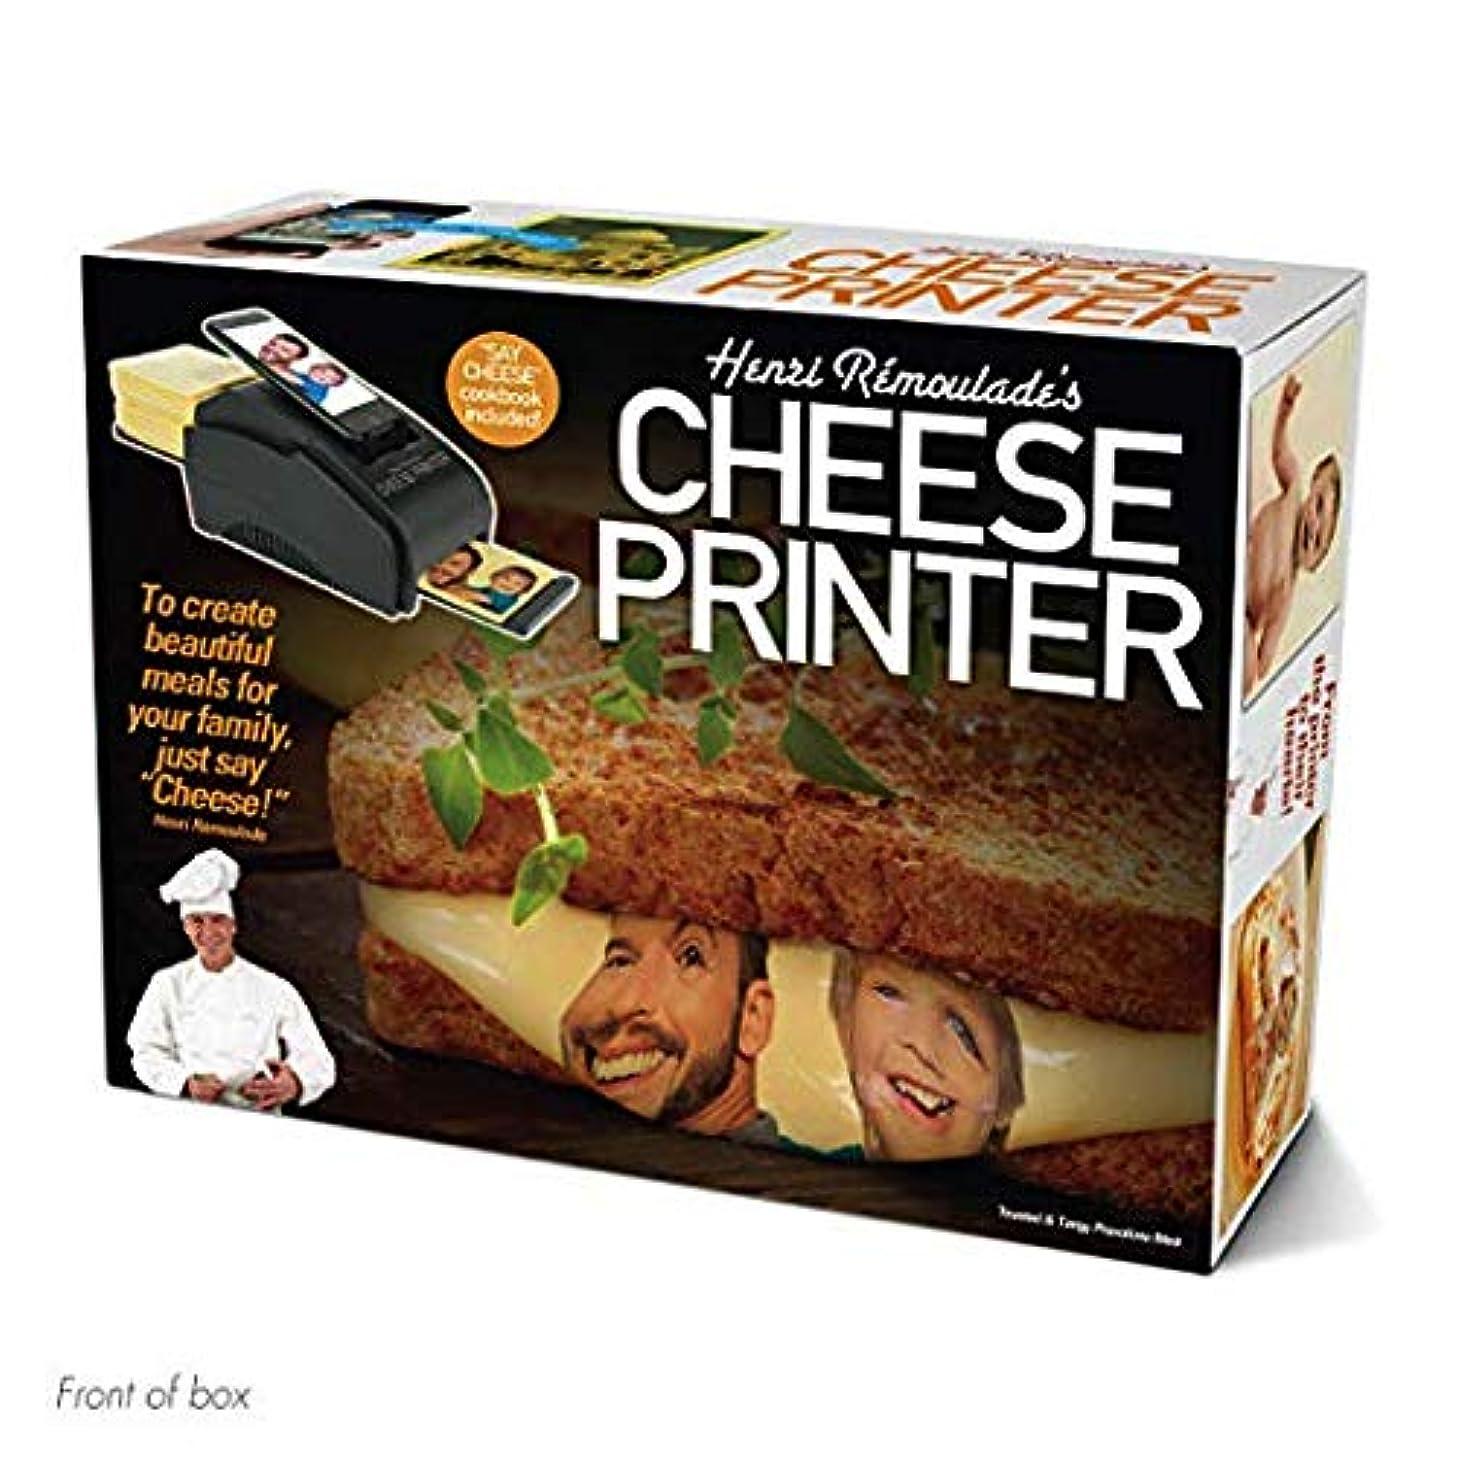 Prank Gift Box by Prank-O (Henri Remoulade's Cheese Printer) Gift Box